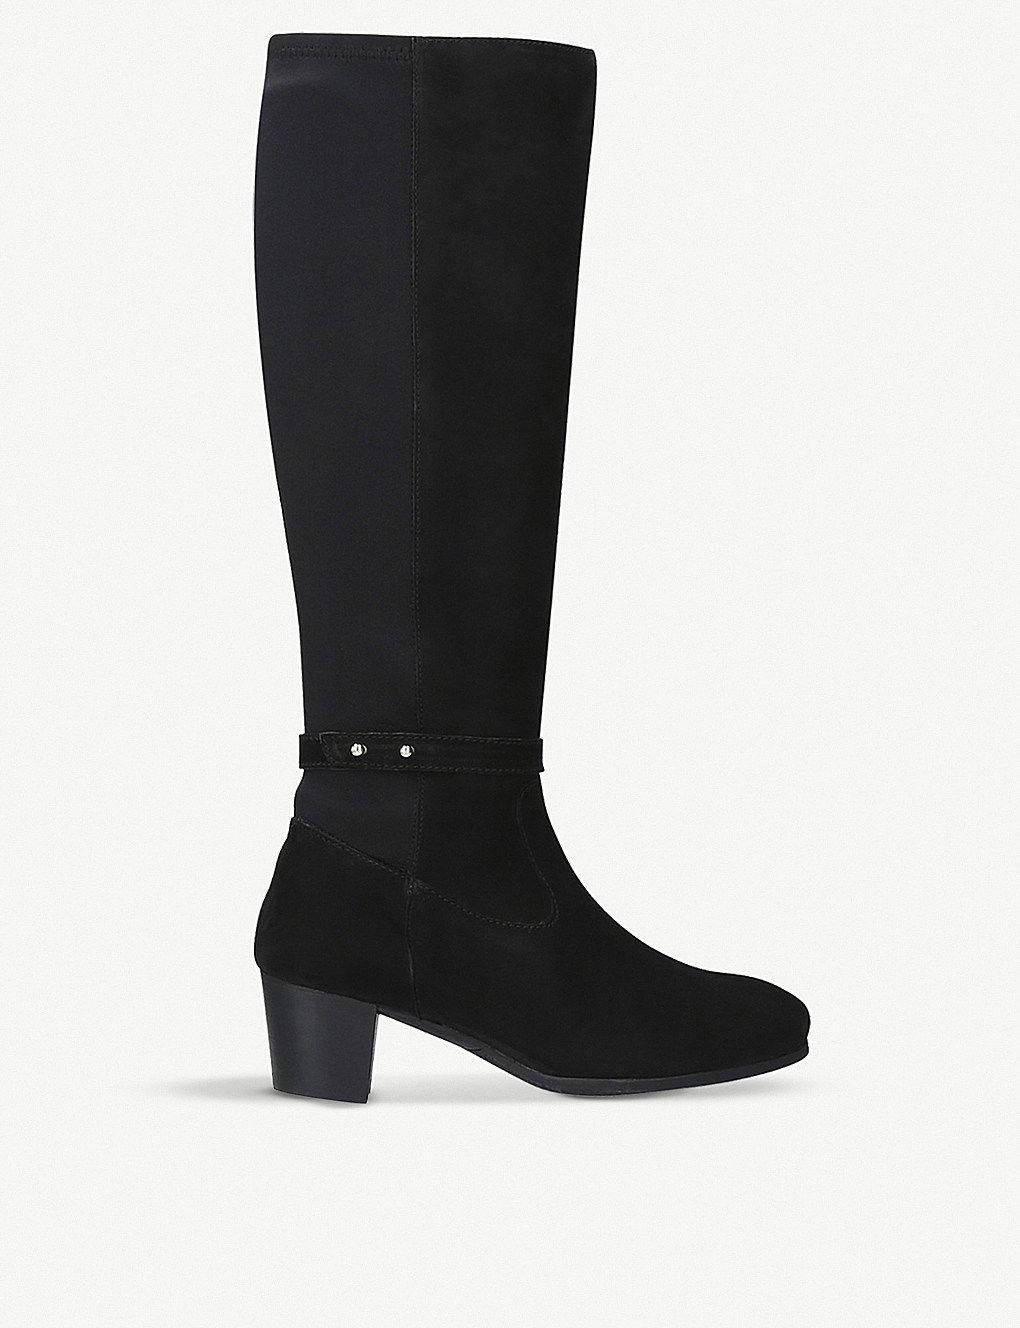 CARVELA COMFORT Violet suede kneehigh boots Knee high